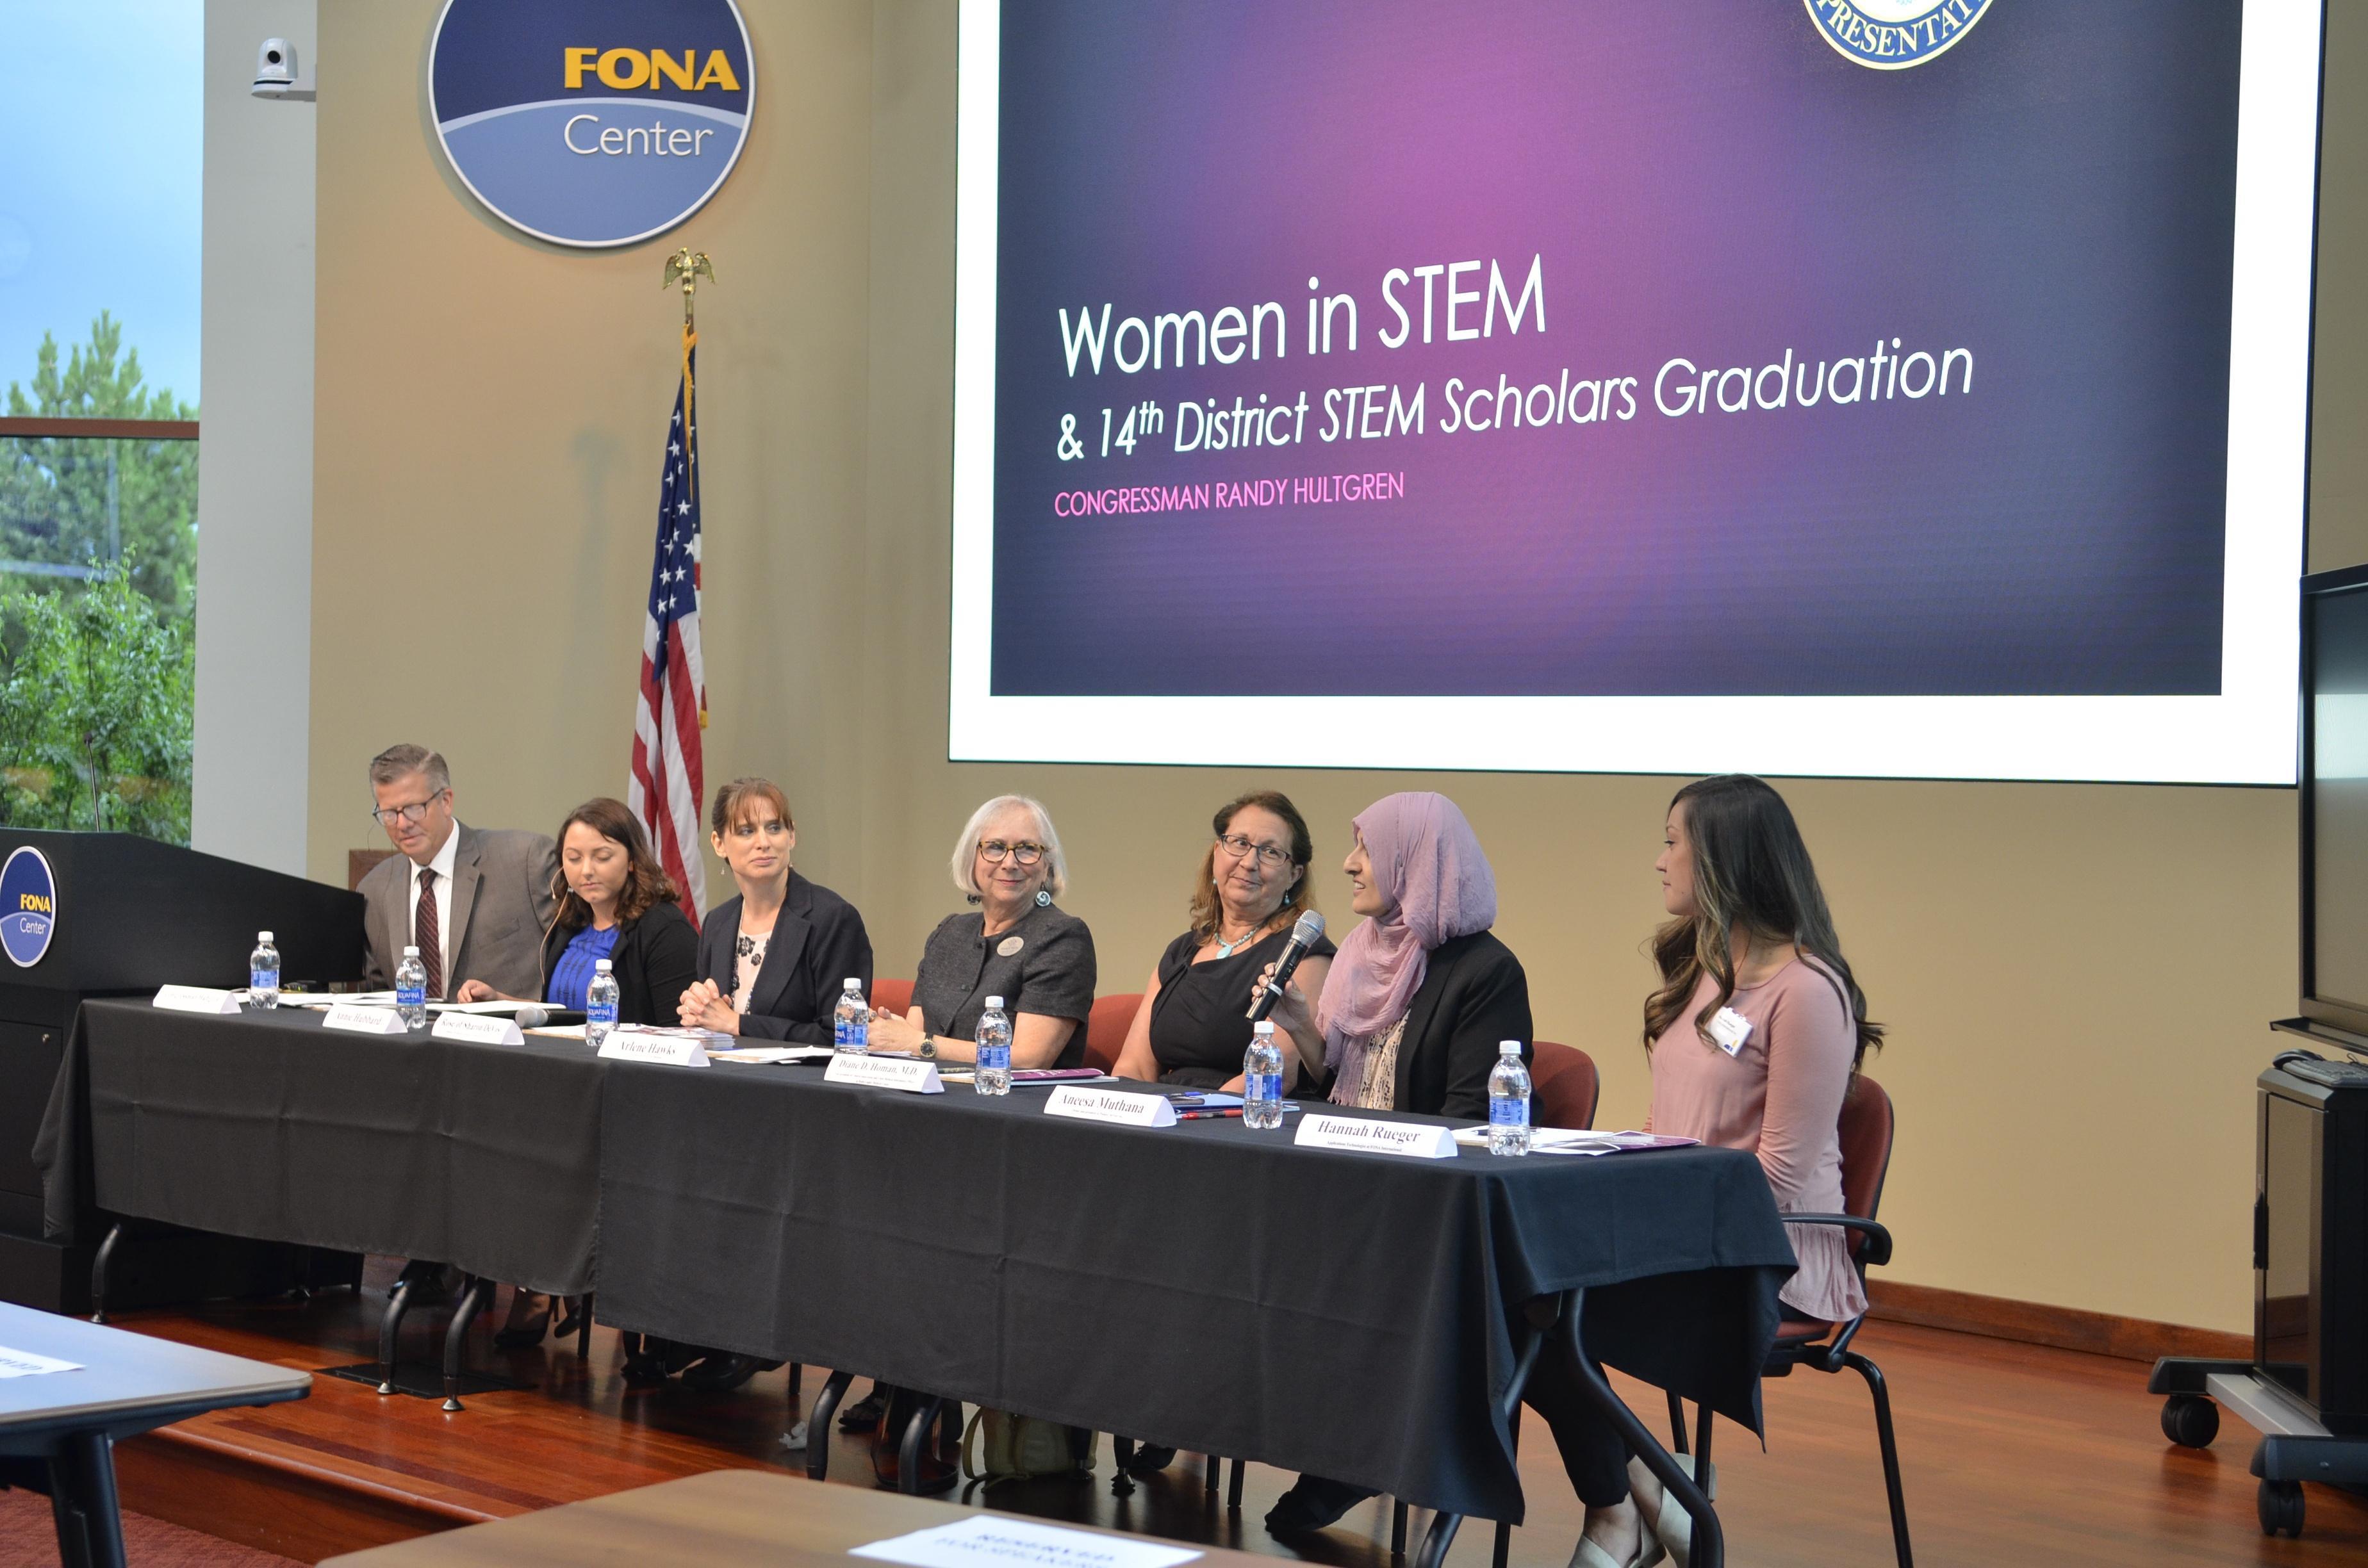 Pioneer Service Women Join Women in STEM Panel to Inspire